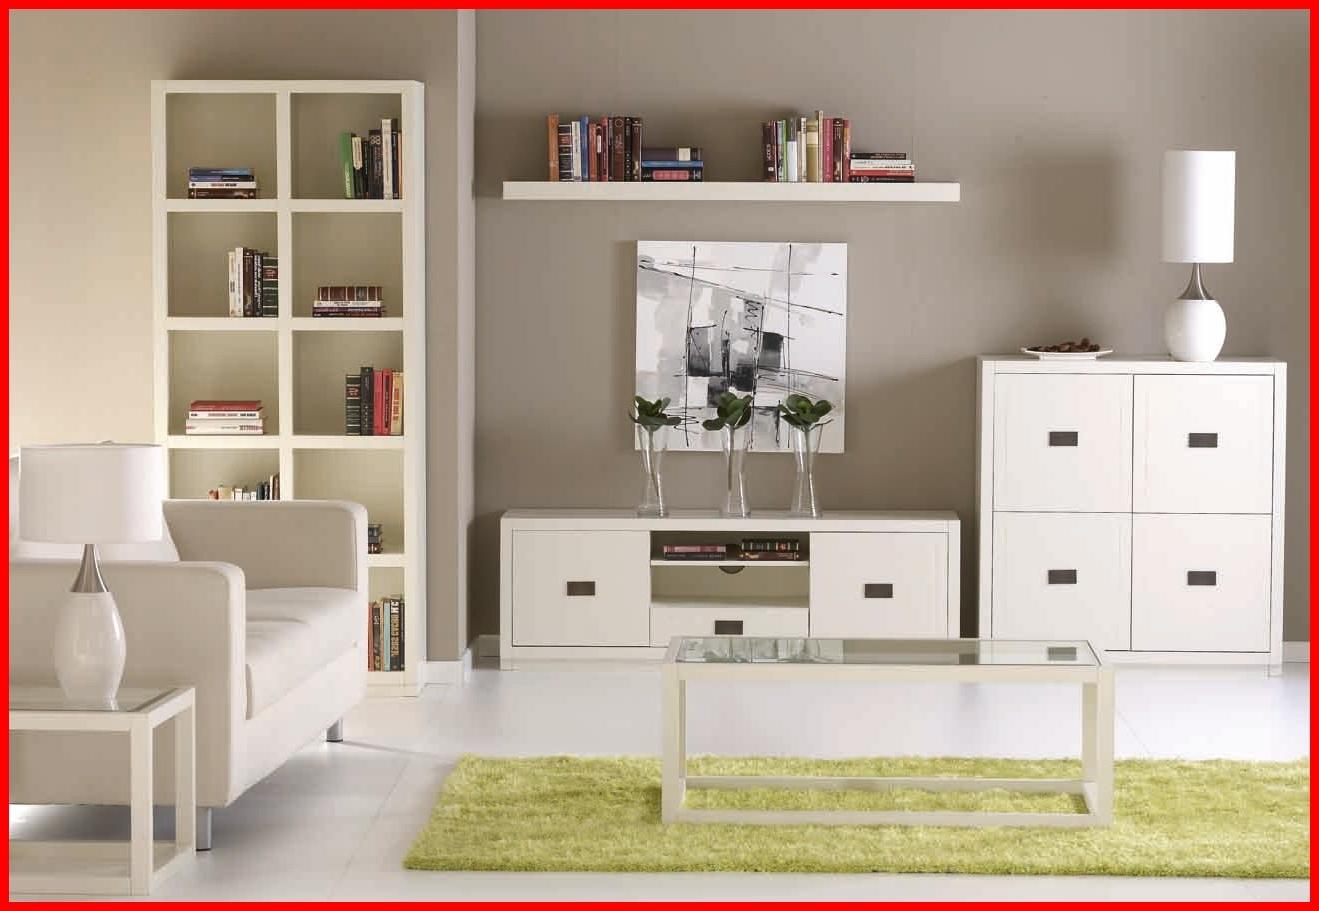 Muebles De Salon Ikea Ofertas Zwd9 Buono Muebles Para Salon Ikea De Ofertas Un Saln En